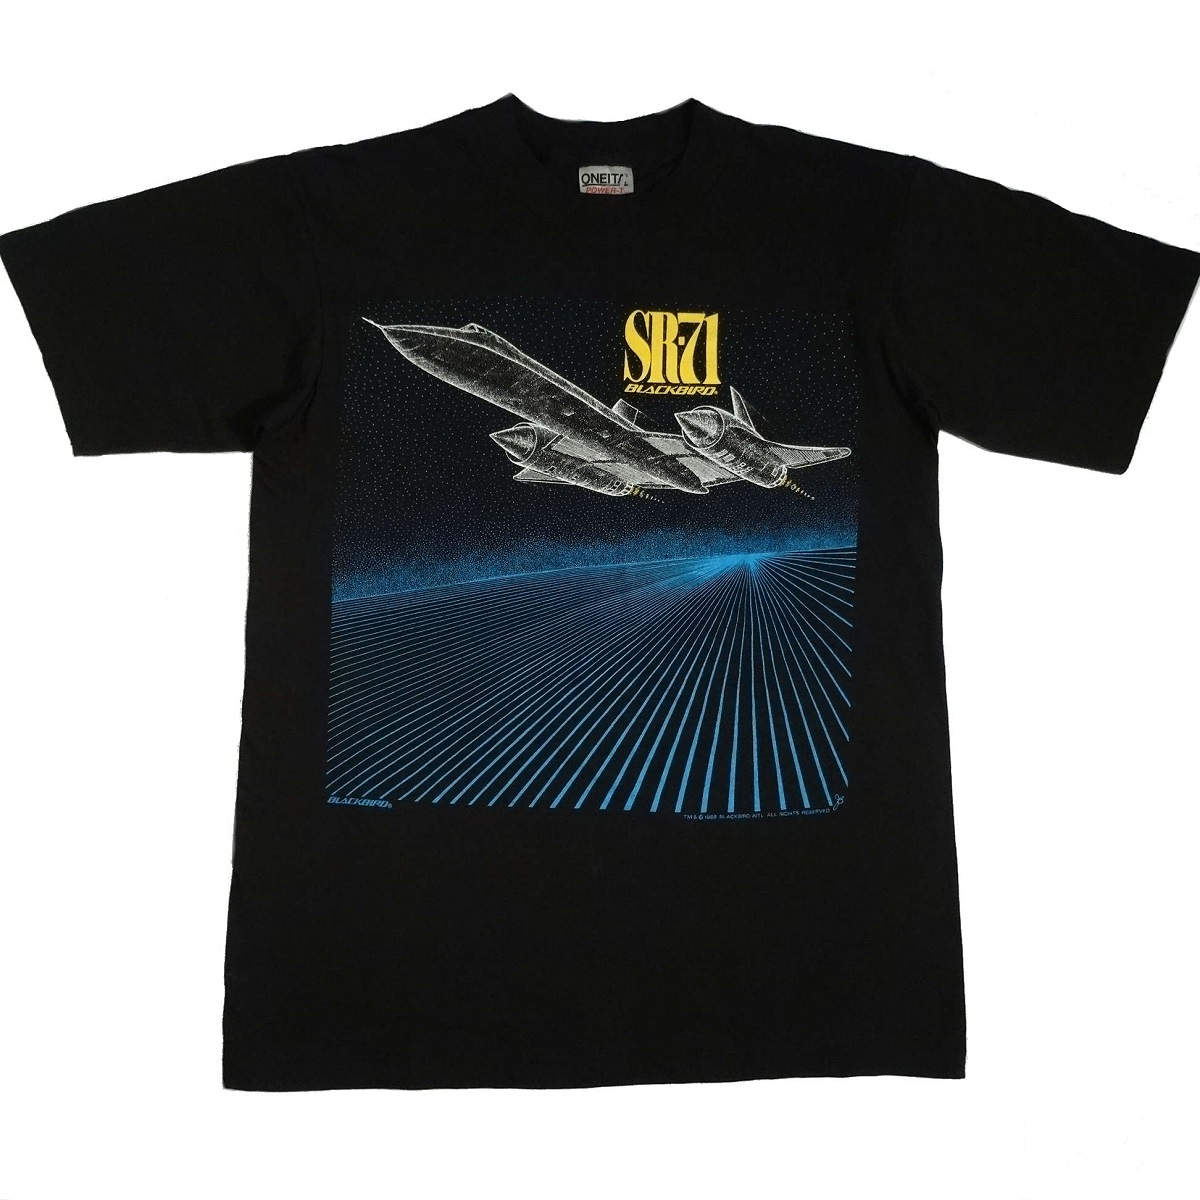 SR-71 Blackbird Lockheed Vintage Shirt Tarks Tees image on front of shirt